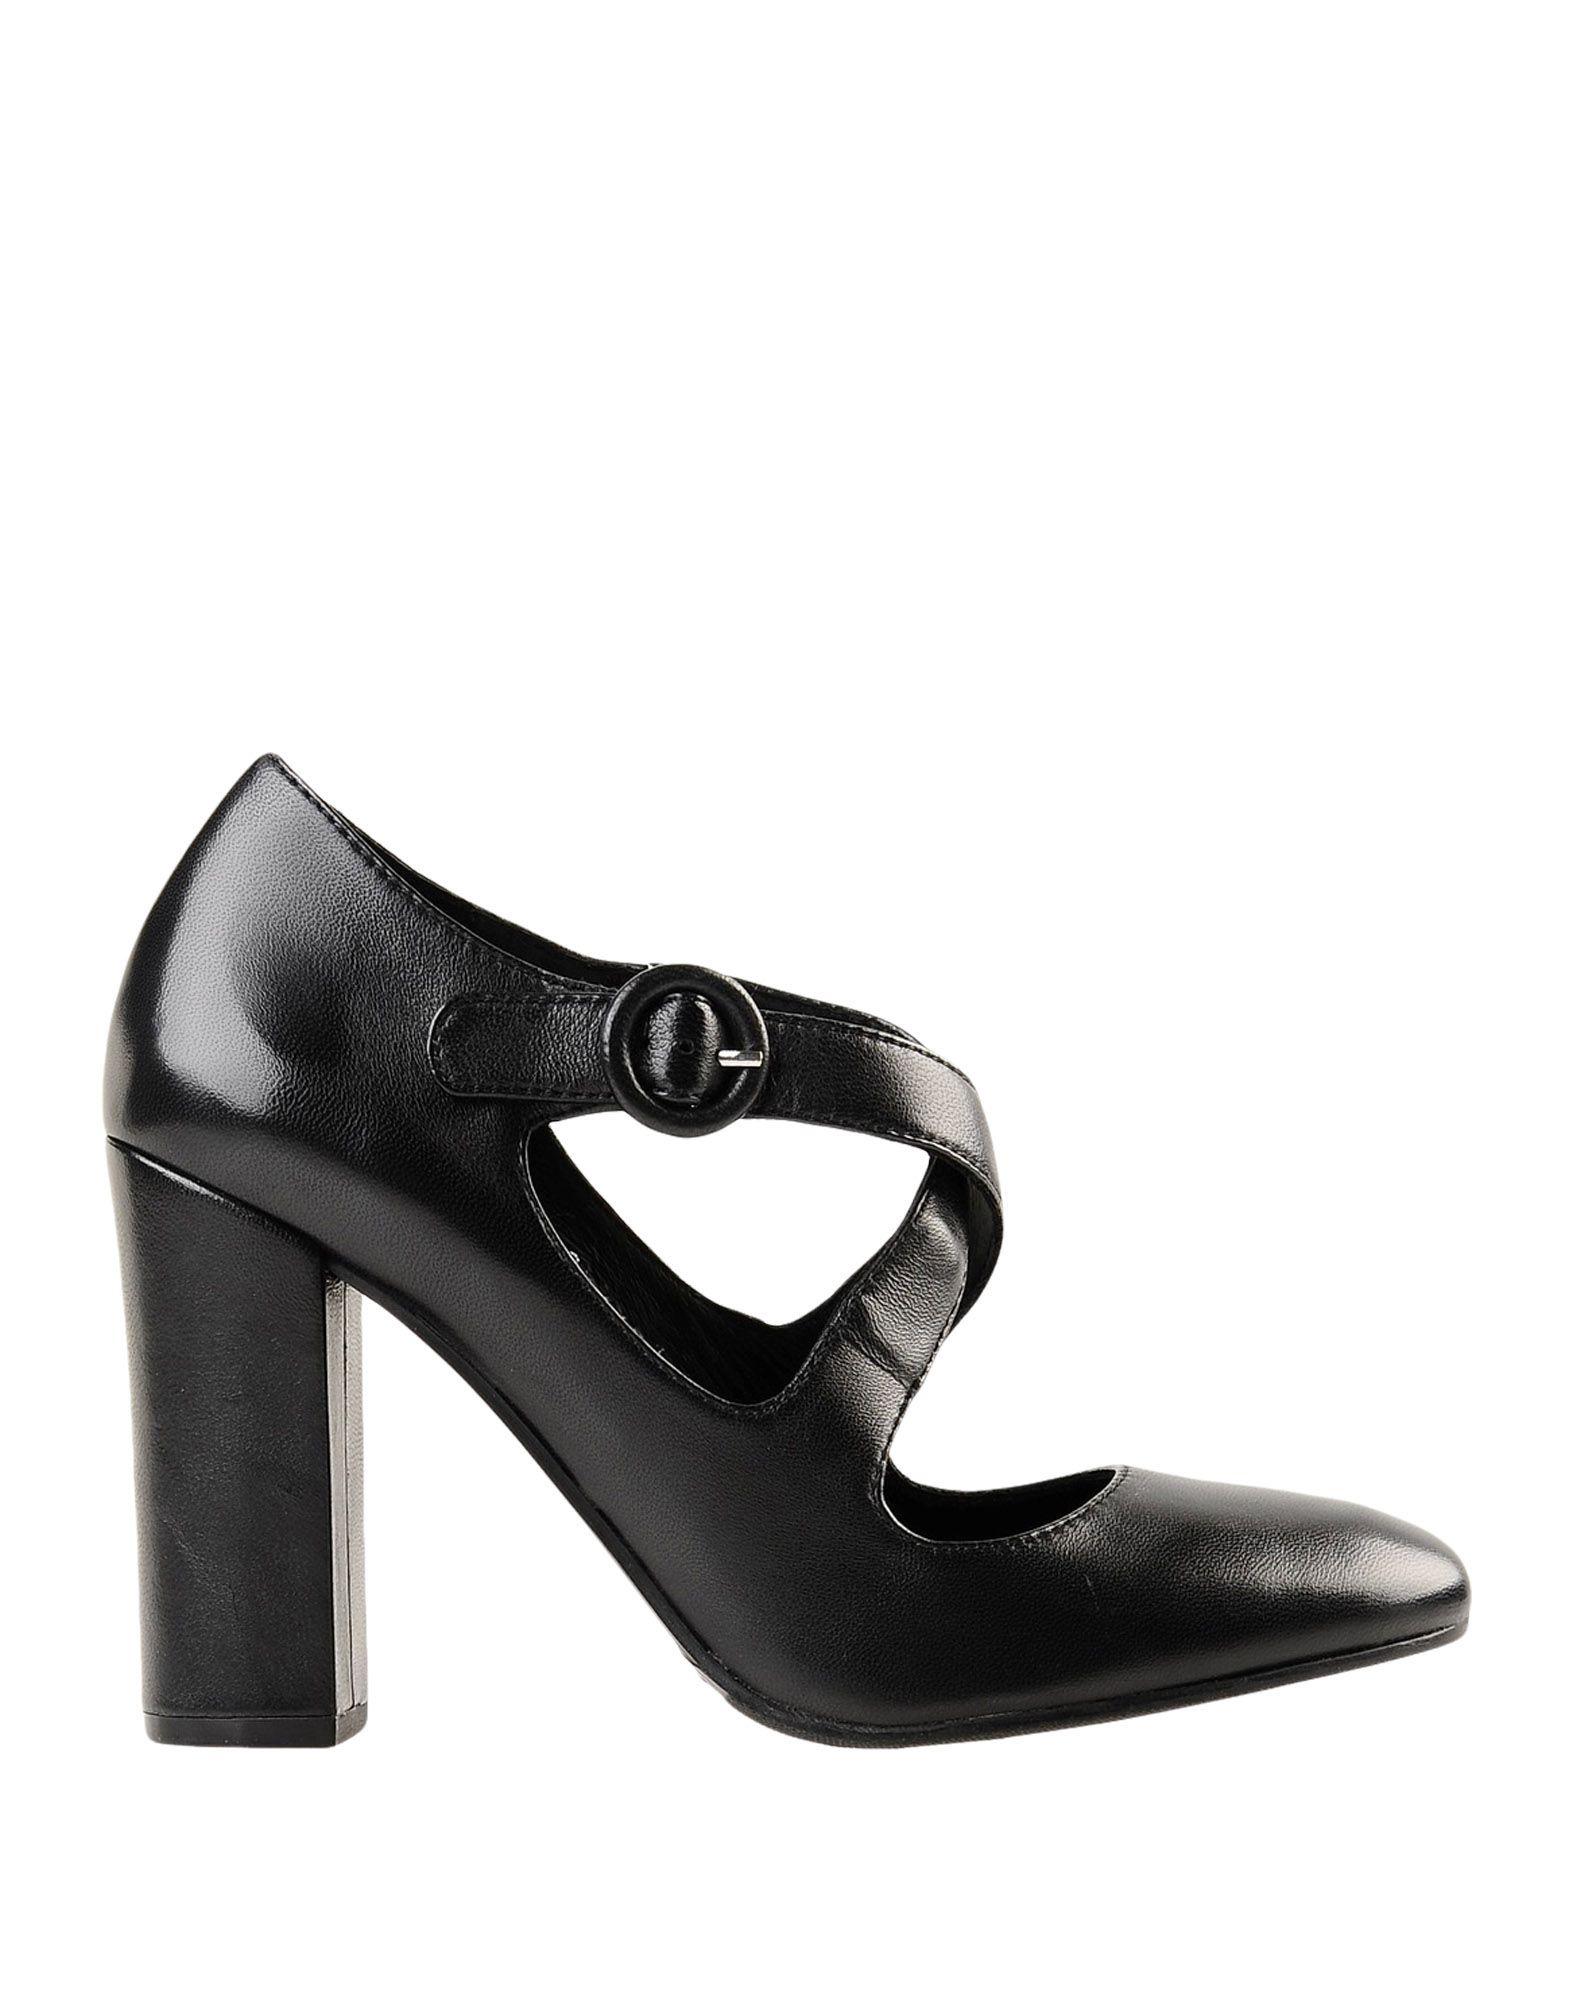 Gut um Premi billige Schuhe zu tragenBruno Premi um Pumps Damen  11538717ER 1deb38